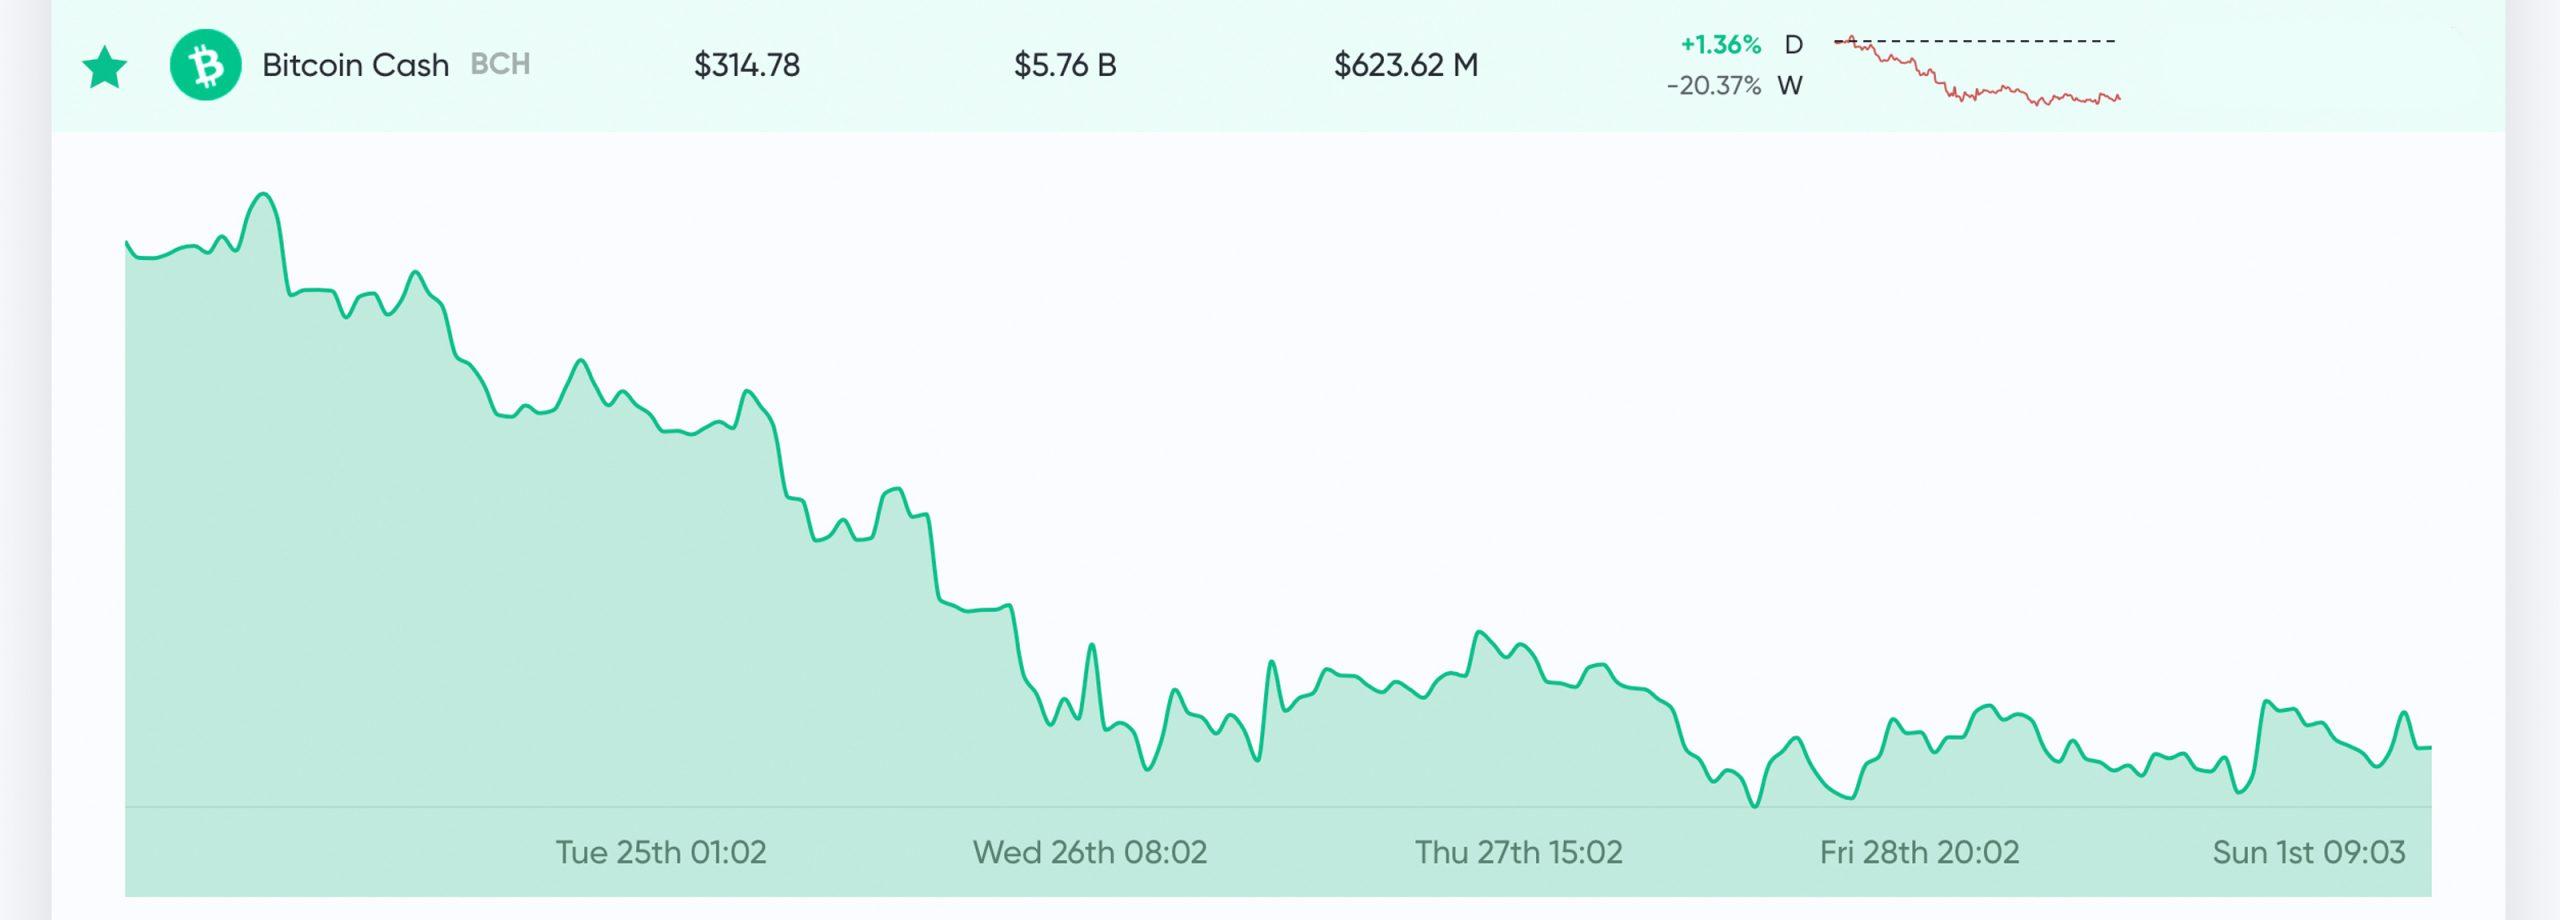 Market Update: Coronavirus Fears, Stock Market Crash, and Bitcoin Price Predictions